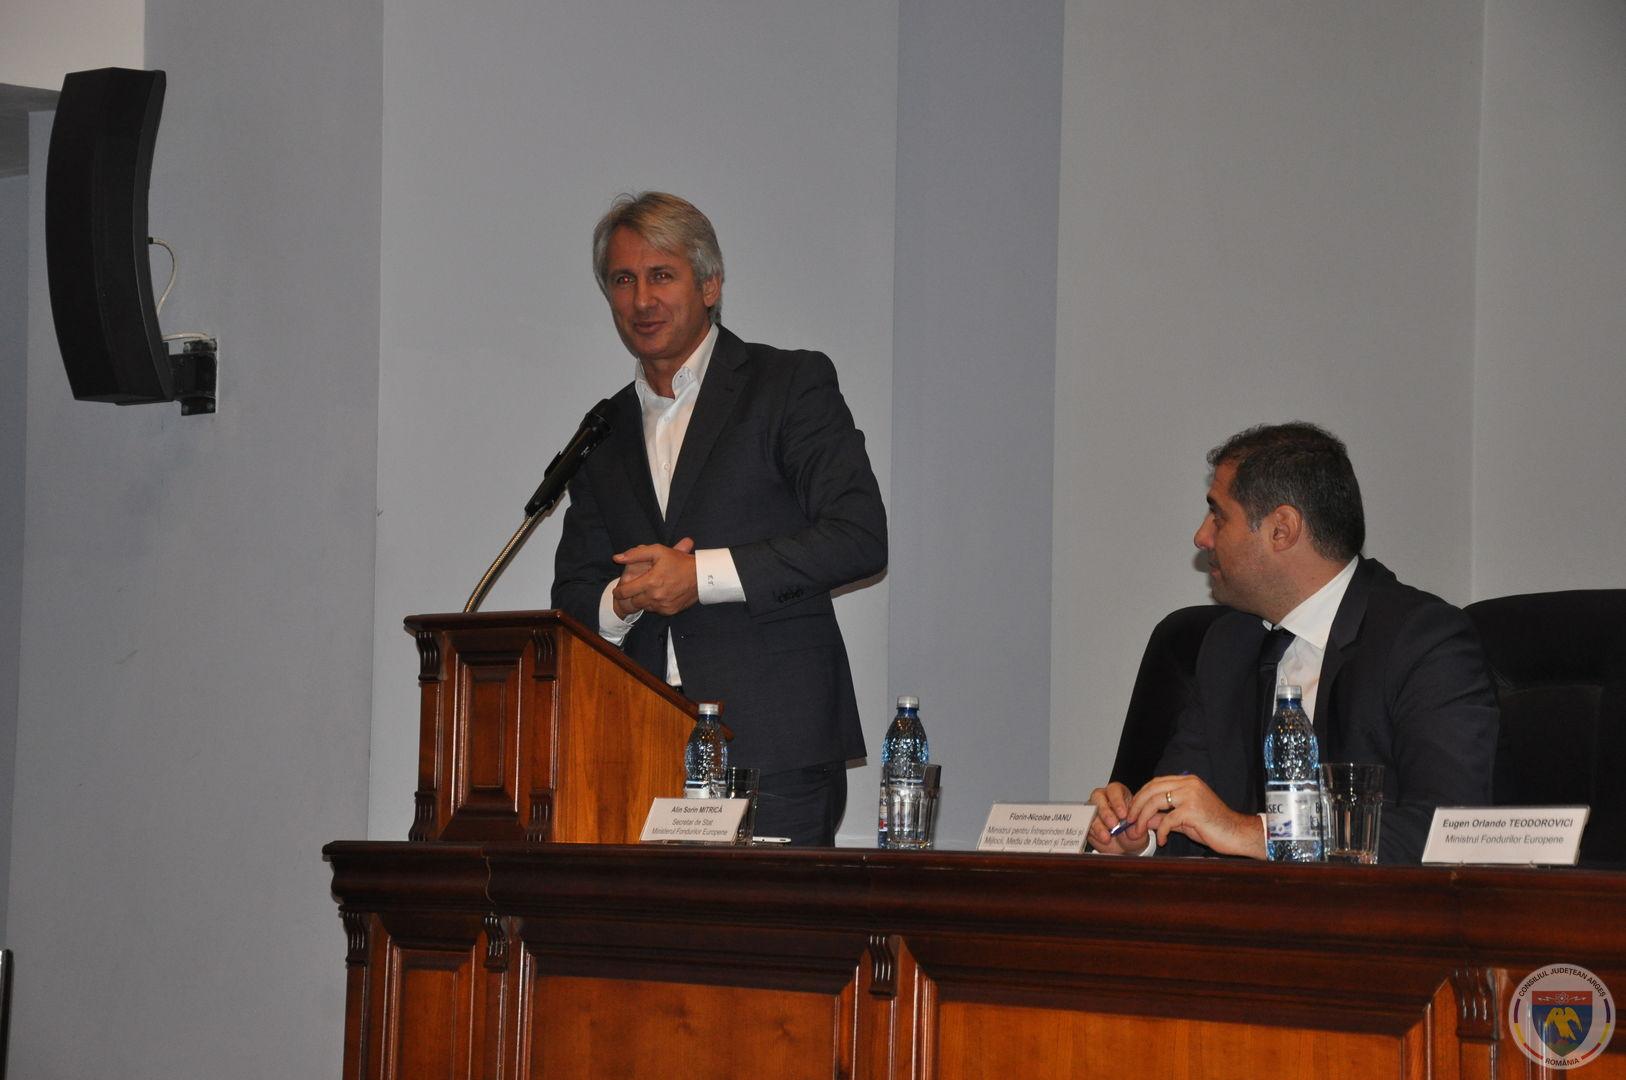 Conferinta Ministrii Teodorovici & Jianu 11.11.2014 (12).JPG